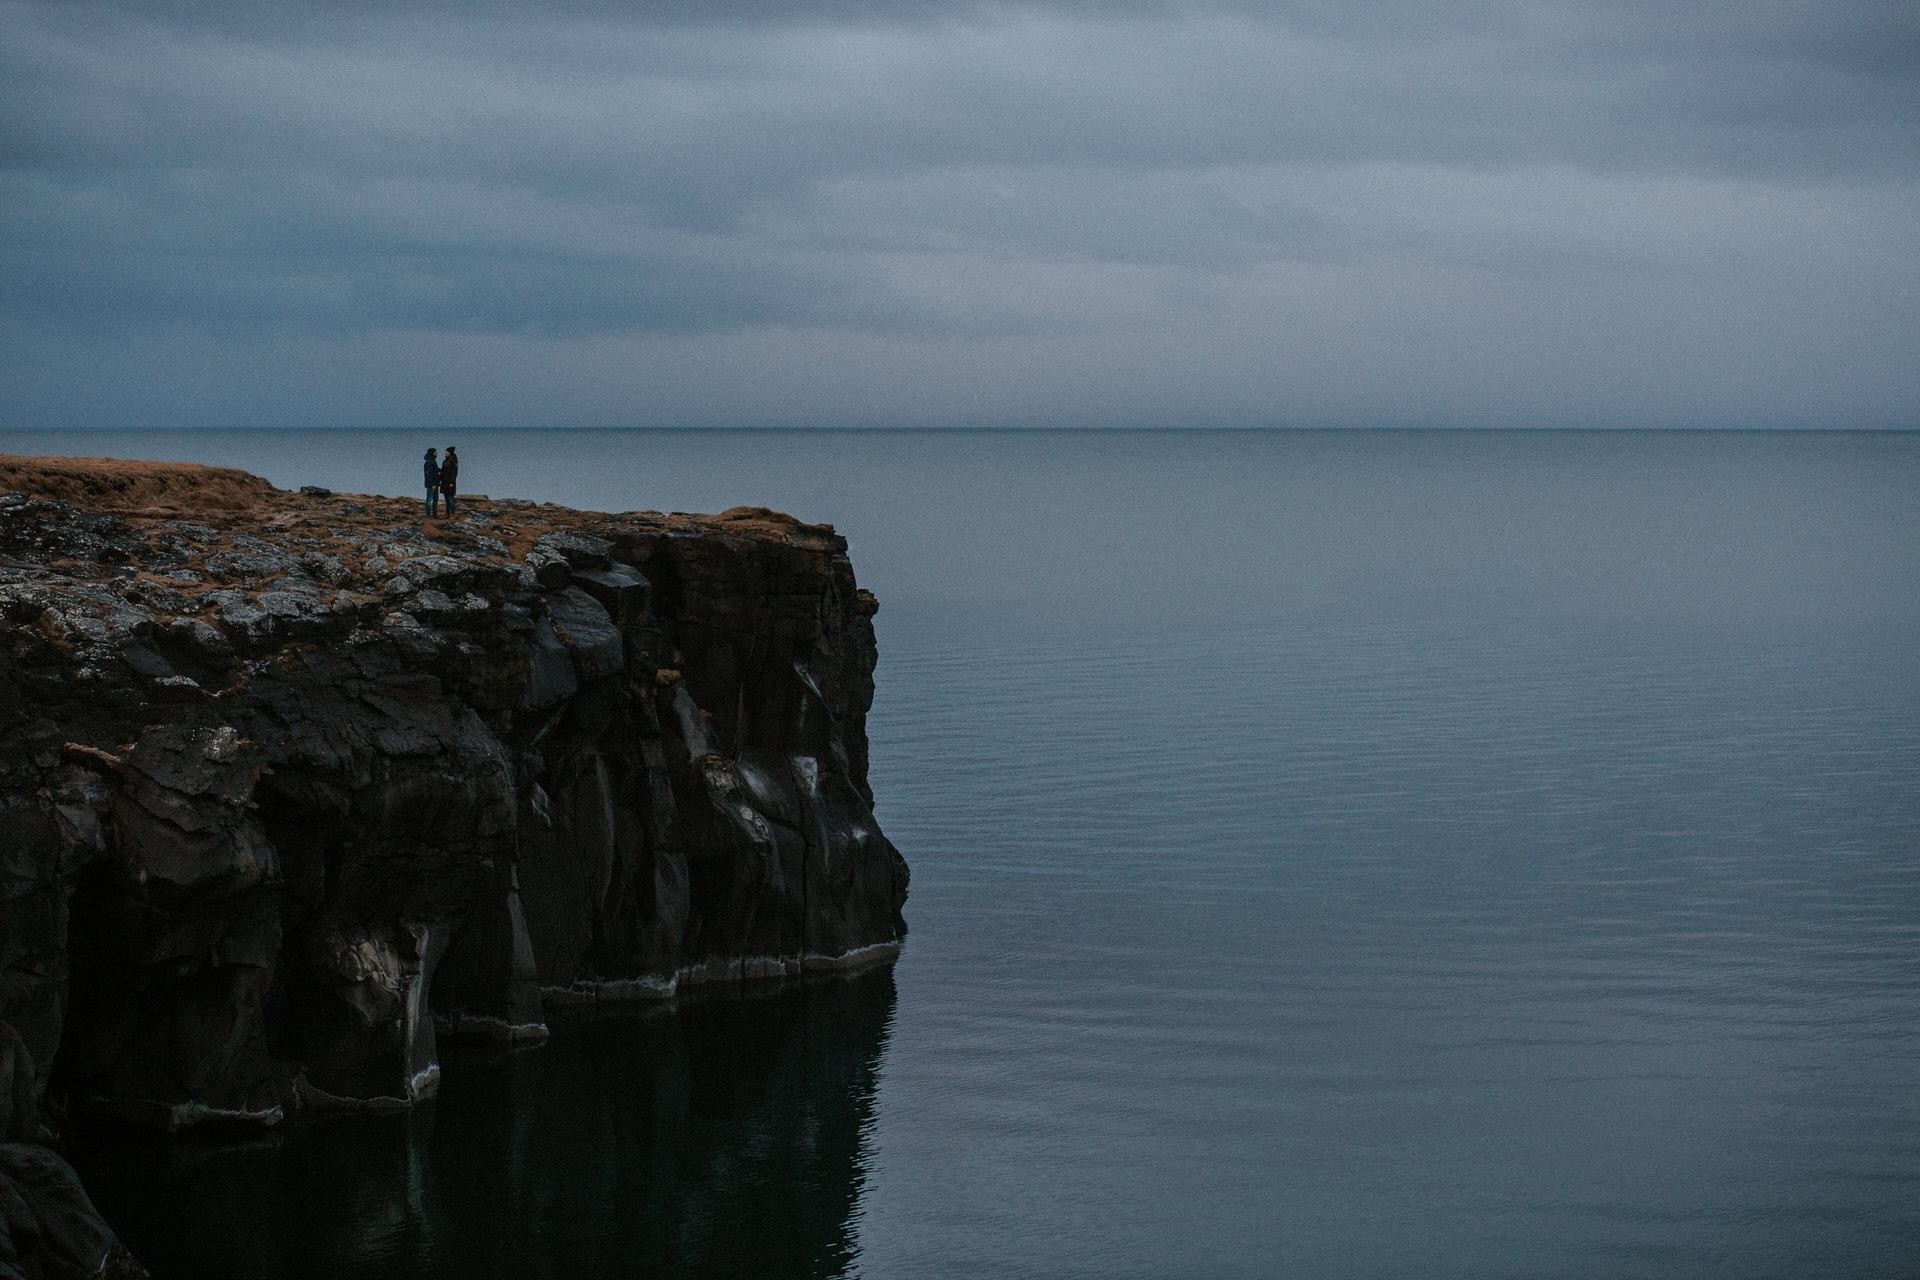 iceland photography engagement sesja narzeczenska islandia - 121.jpg